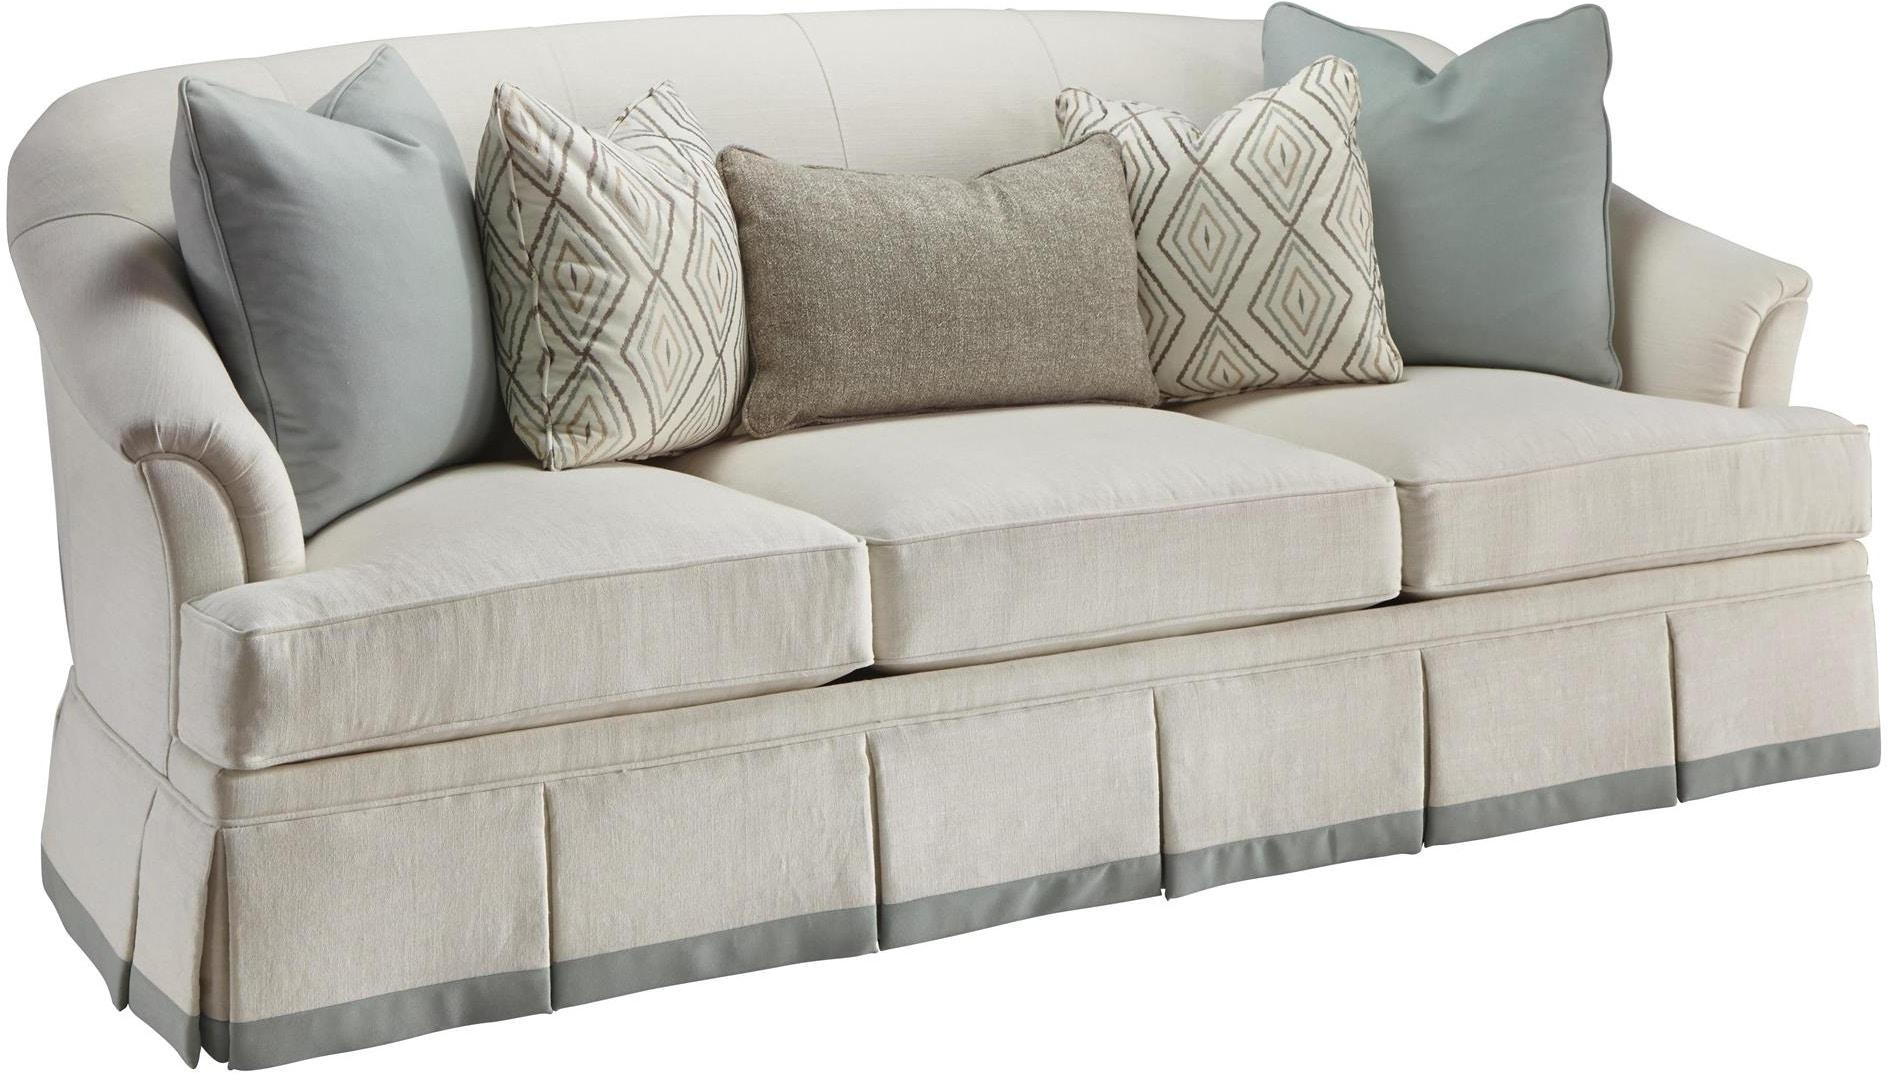 Fine Furniture Design Living Room Isabella Sofa 5812 01